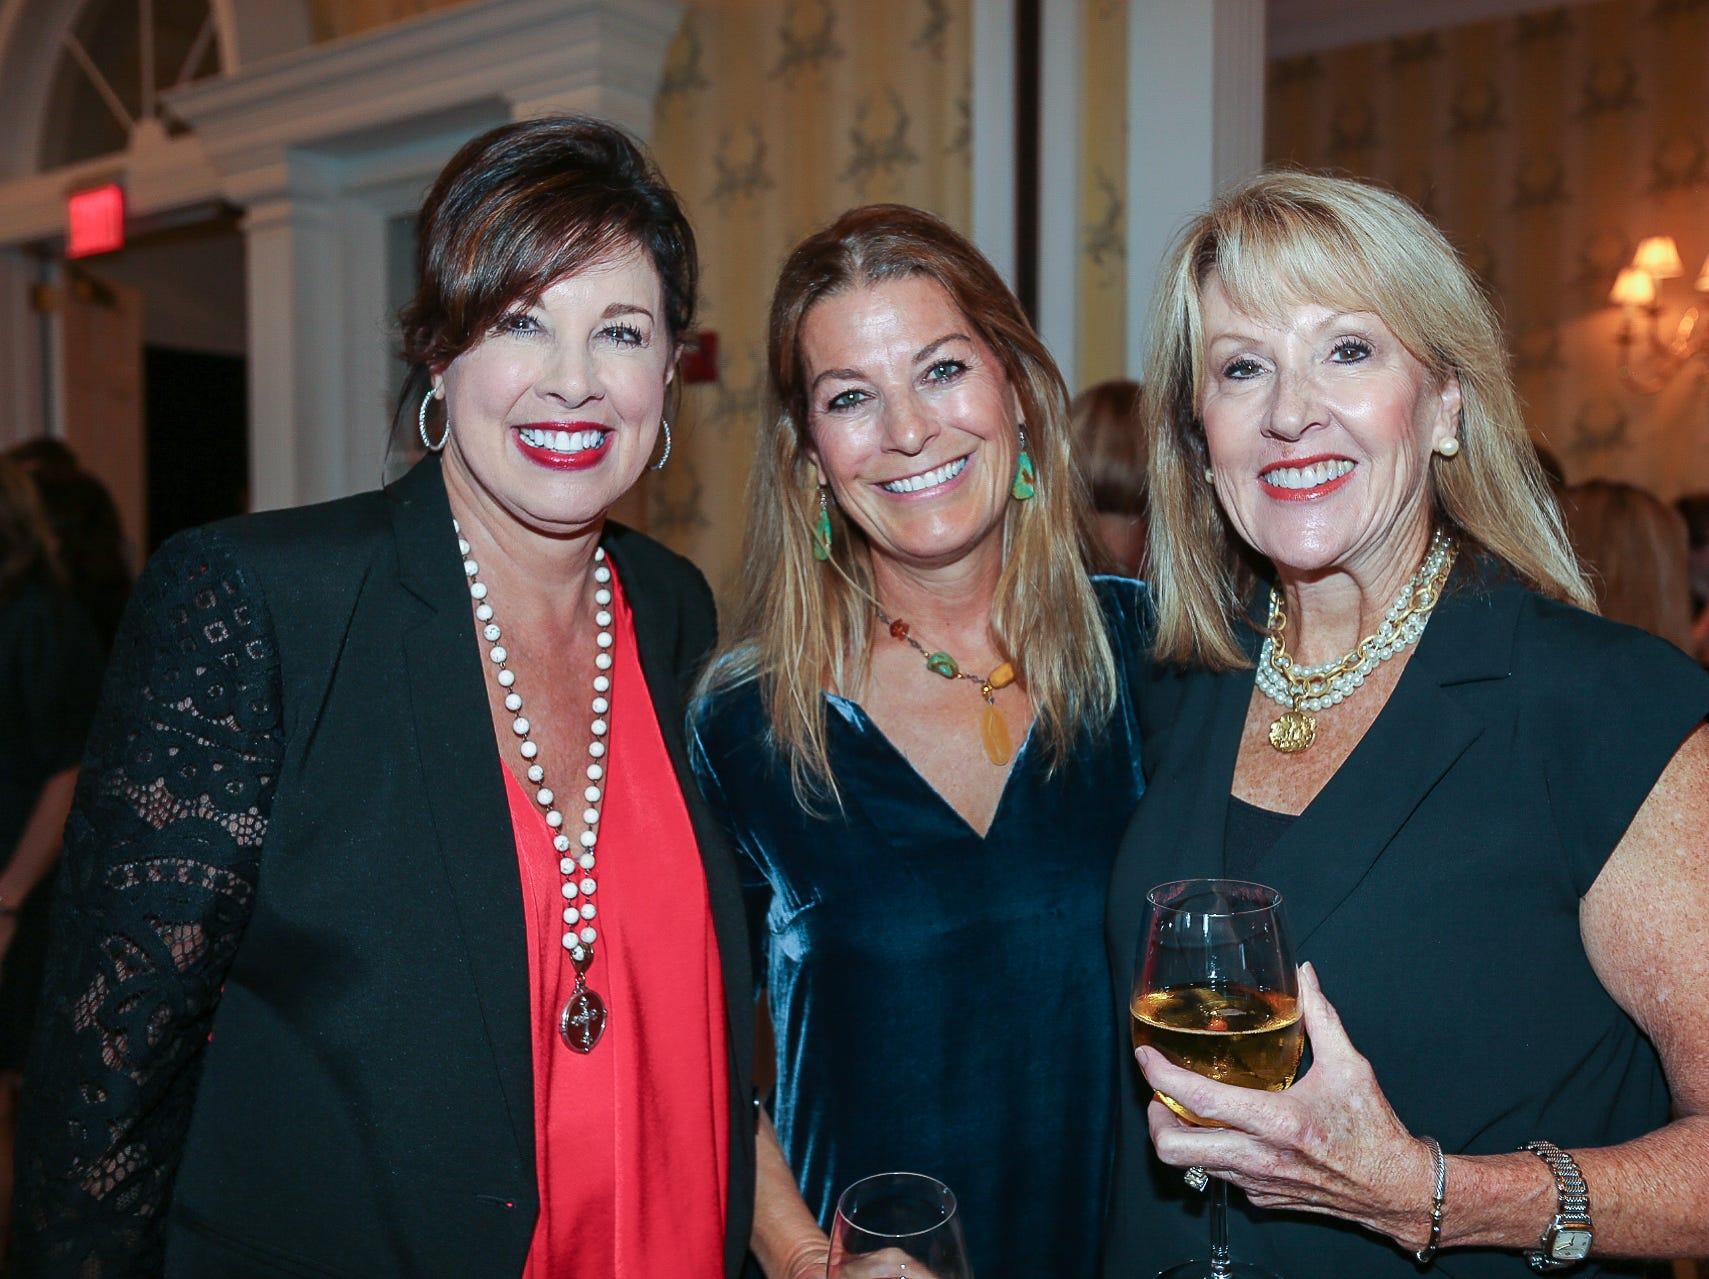 Jeanette Hutcheson, Silvia Sheppard, and Marilyn Bueker